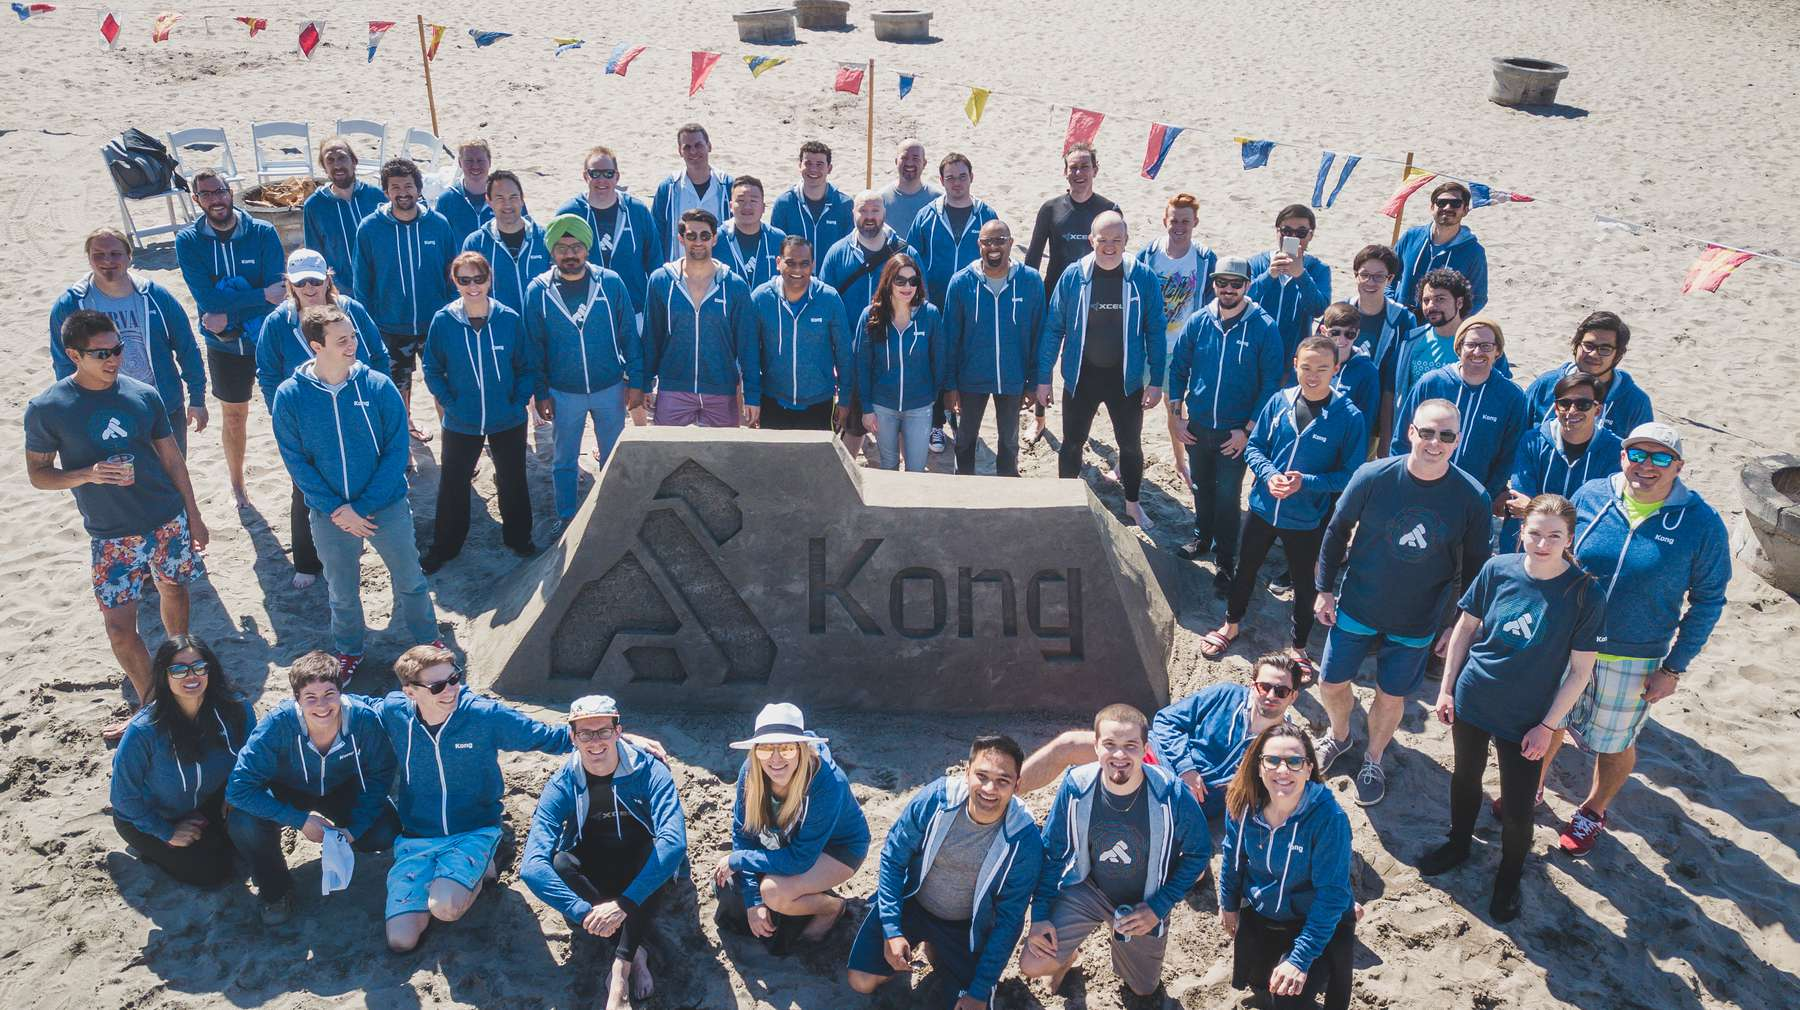 The Kong team